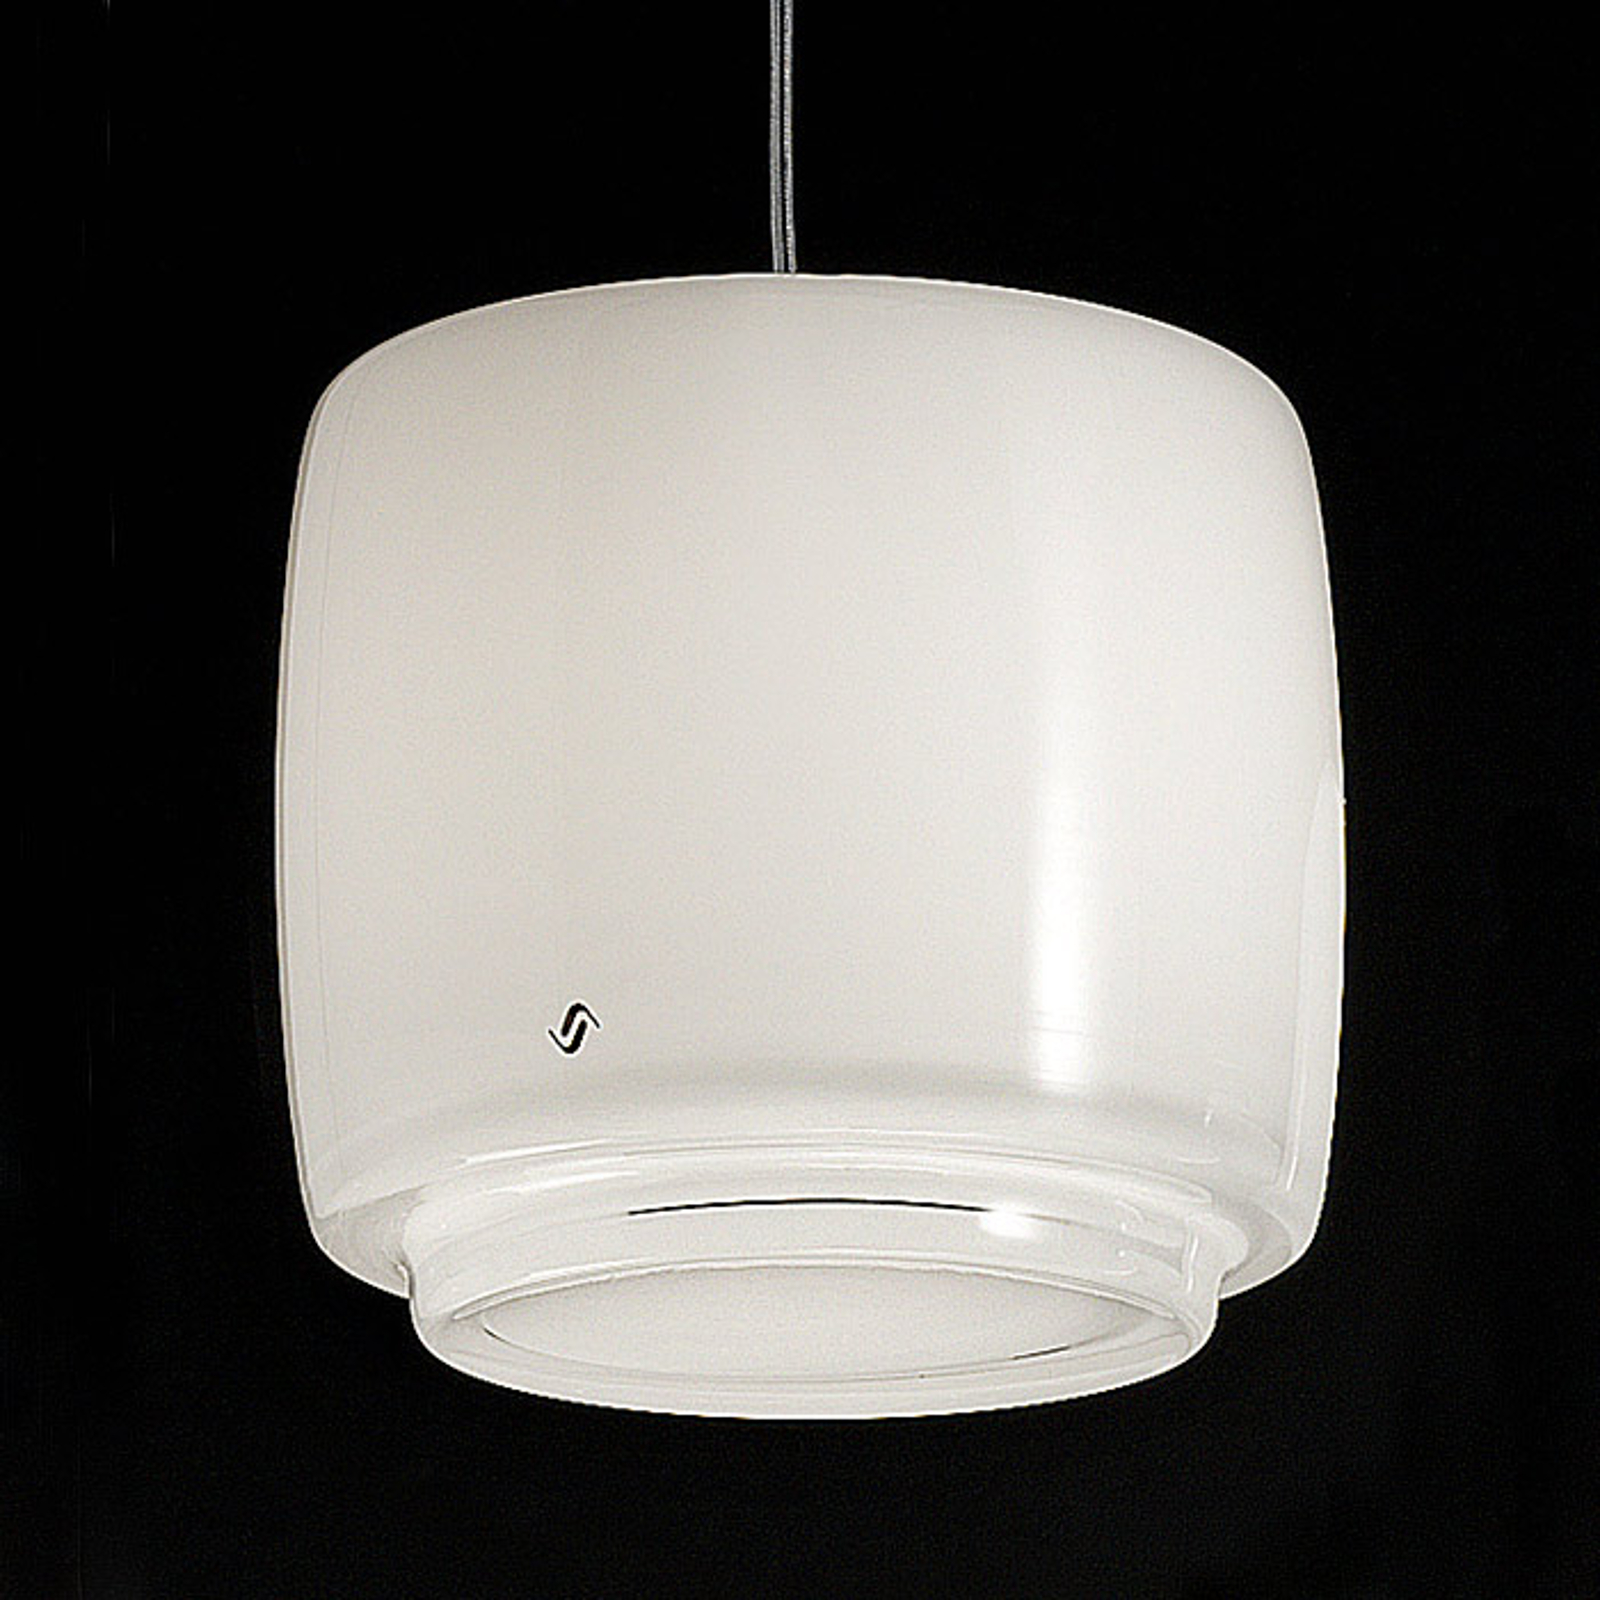 Glasshengelampe Bot, Ø 16 cm